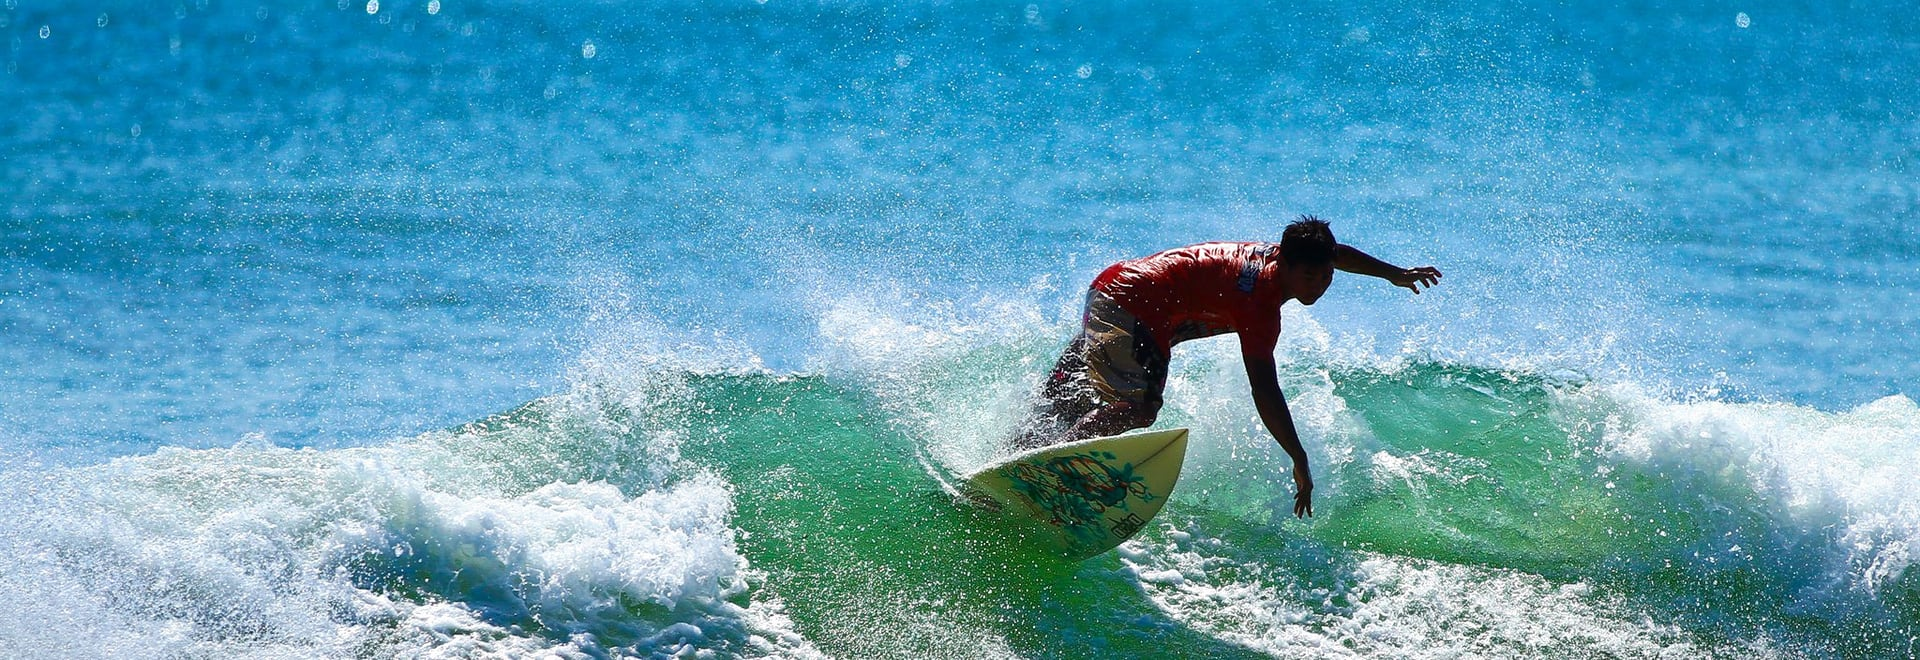 1491994549_kuta_indonesia_surfer.jpg